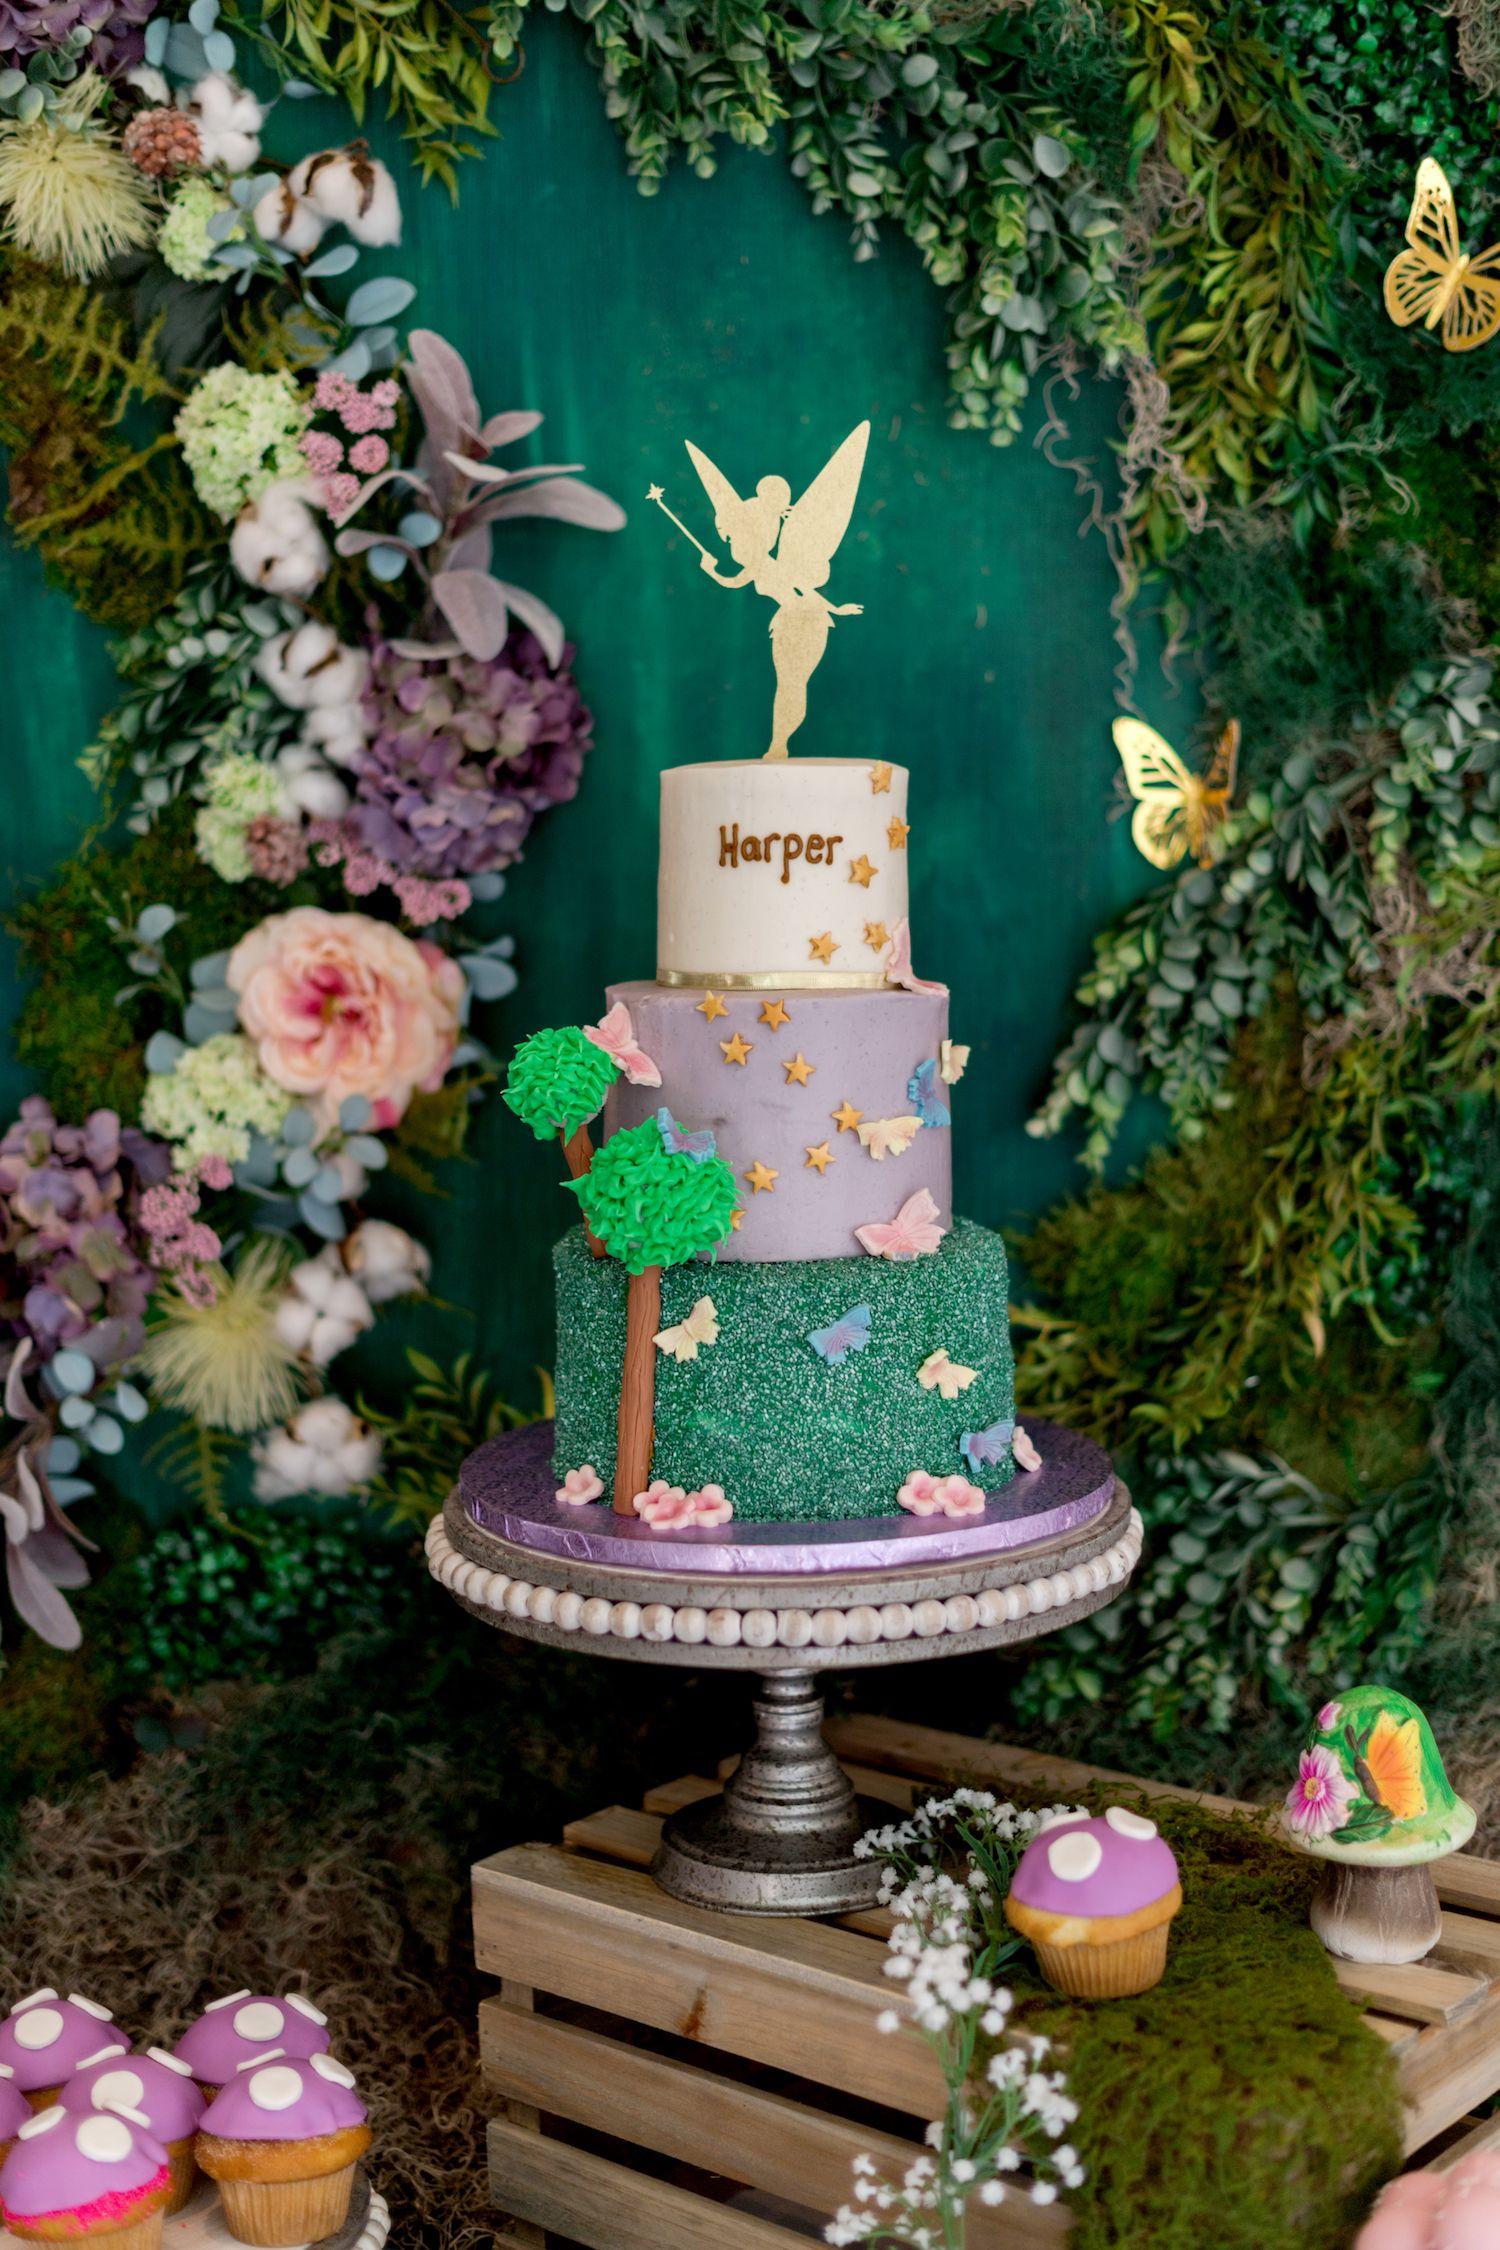 Fairy garden inspired birthday party in 2020 fairy